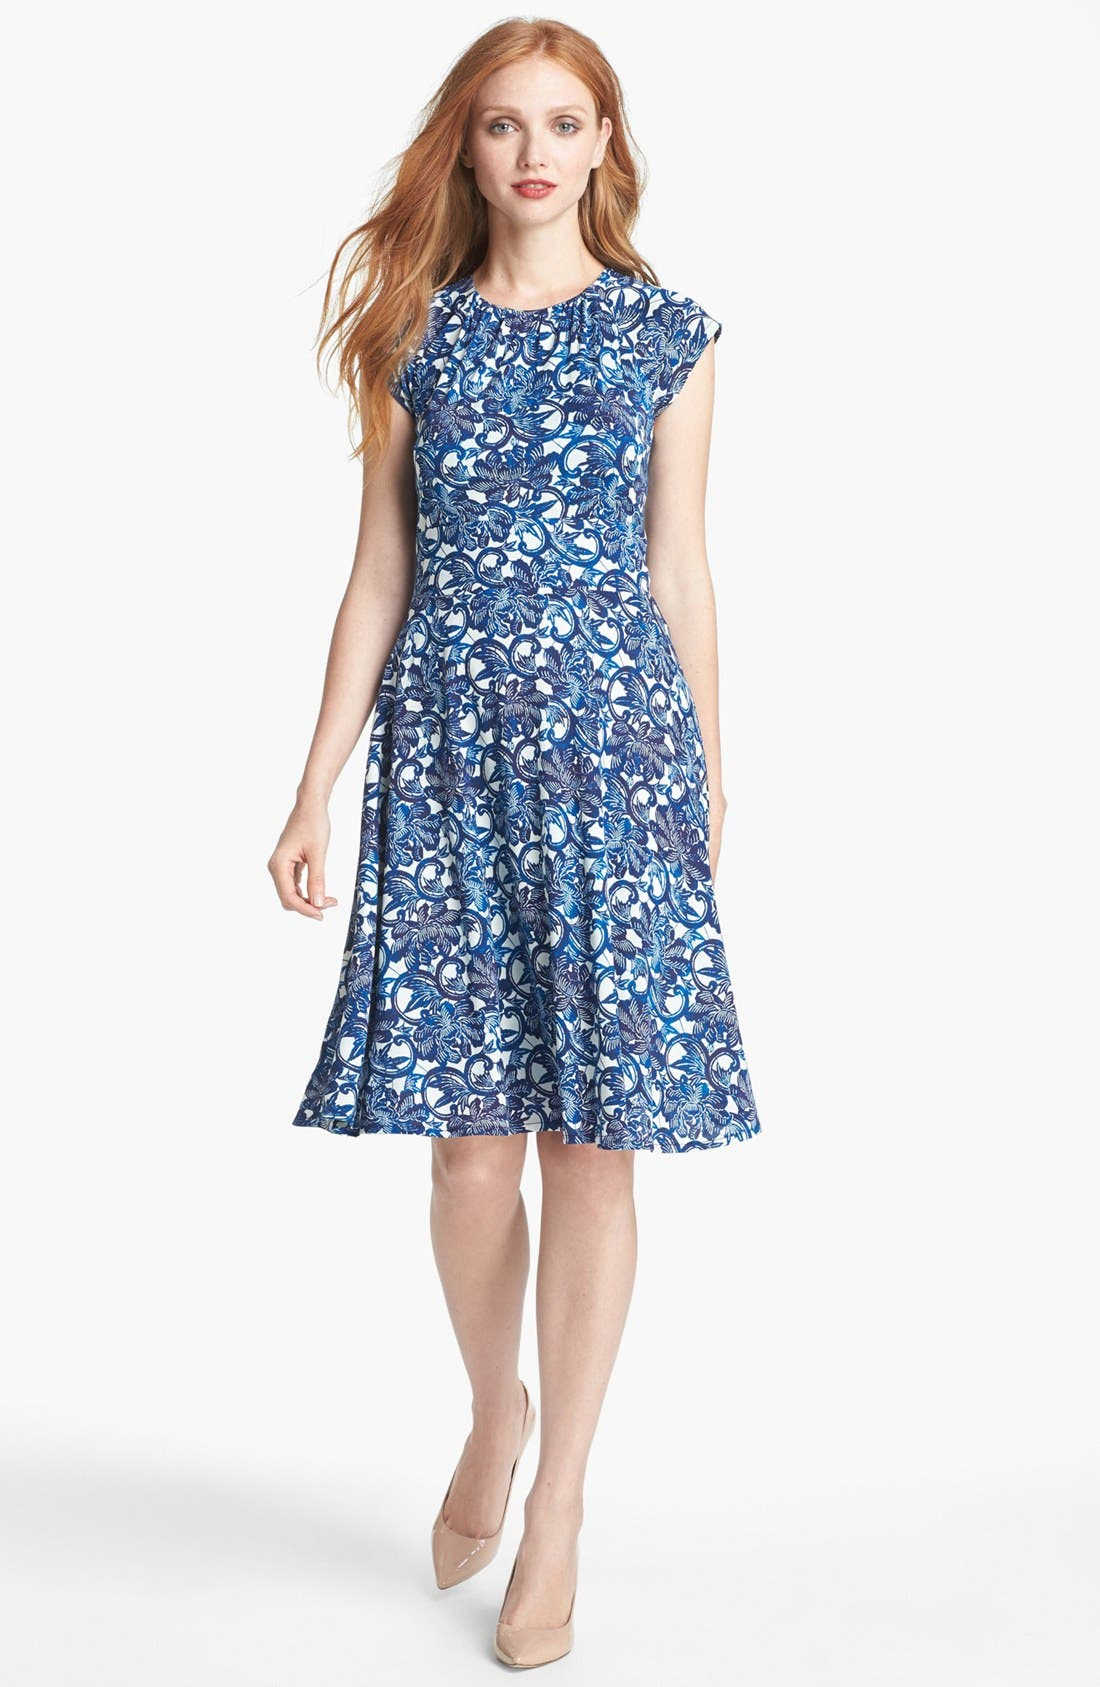 Main Image - Tory Burch 'Sophia' Silk Fit & Flare Dress